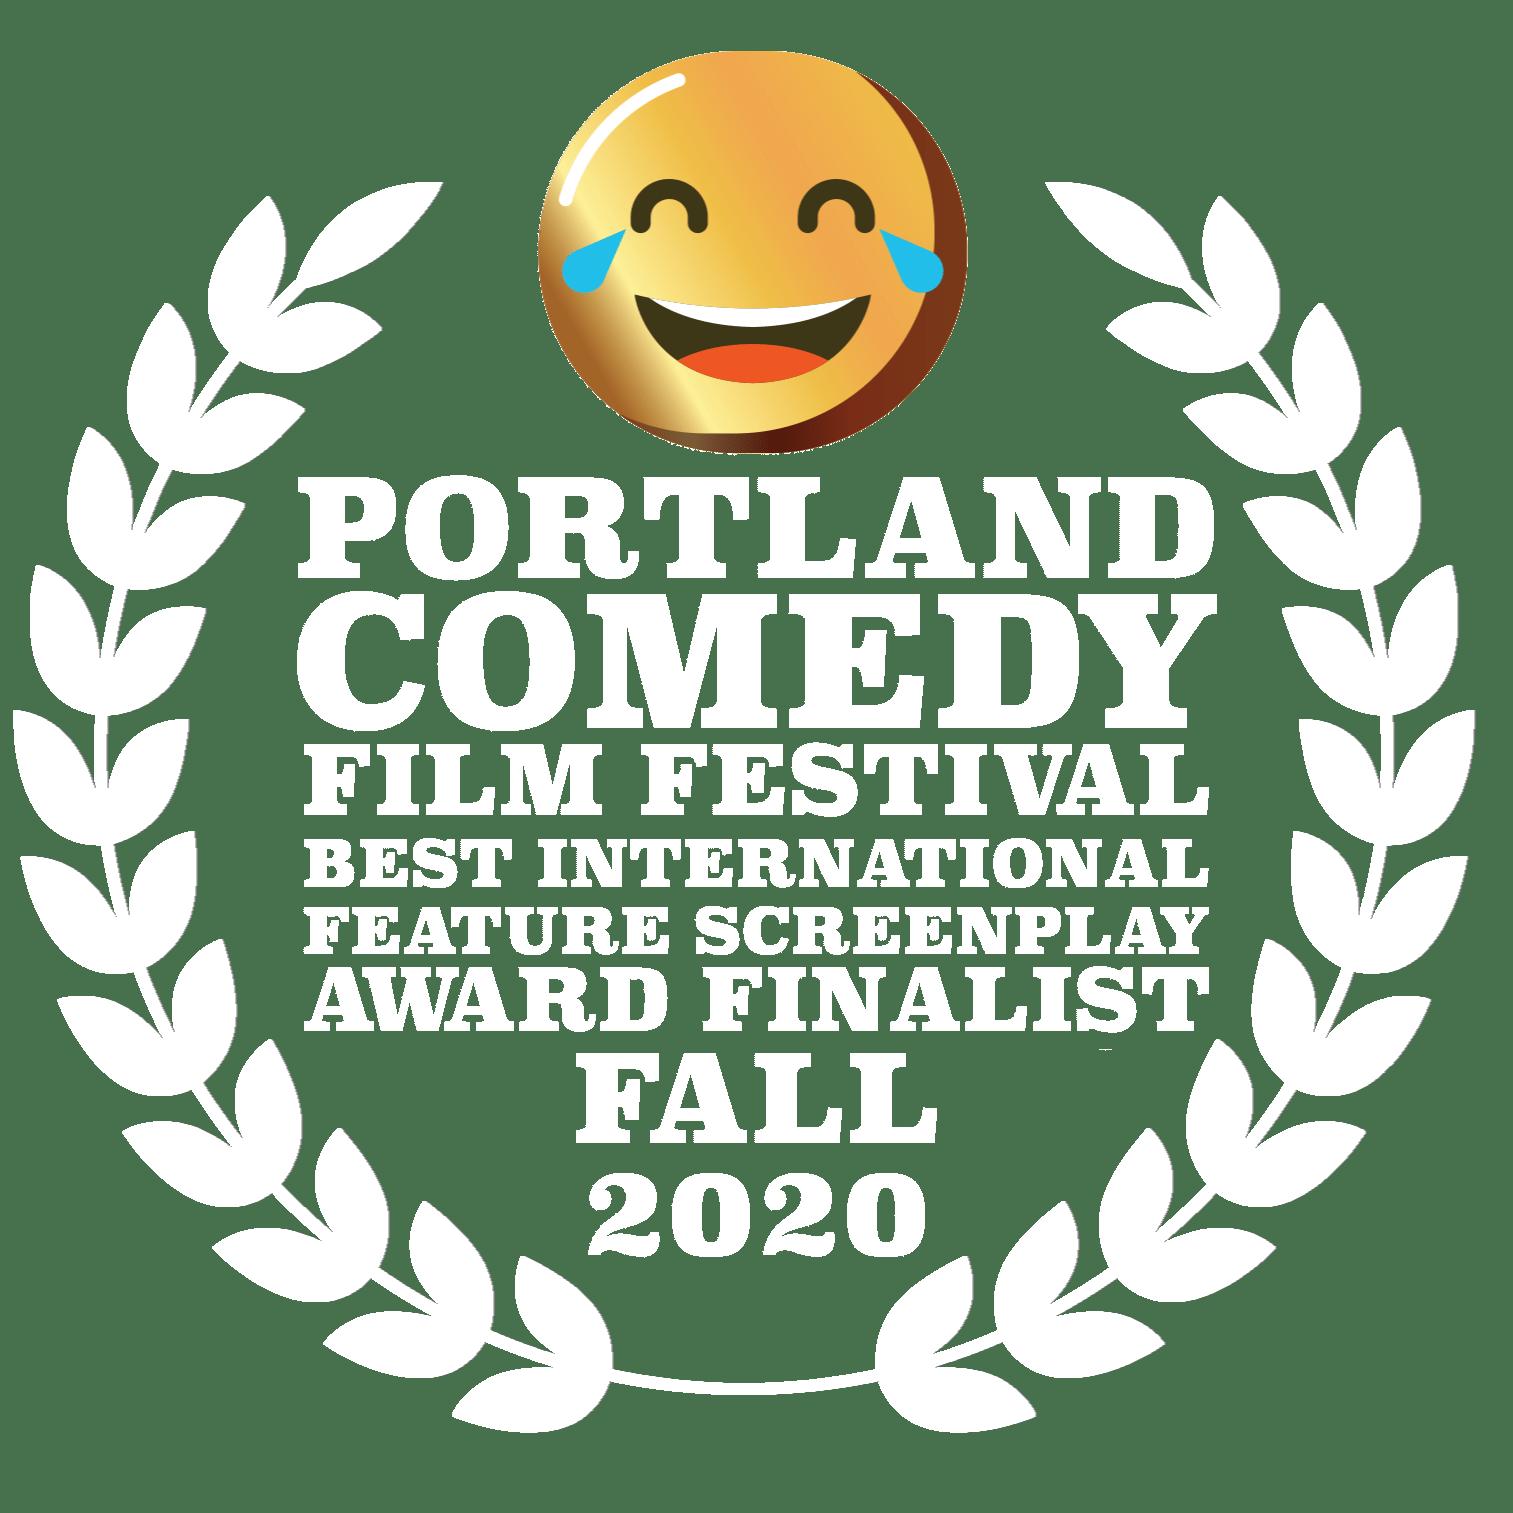 Best International Feature Screenplay Award Finalist Portland Comedy Film Festival Fall 2020